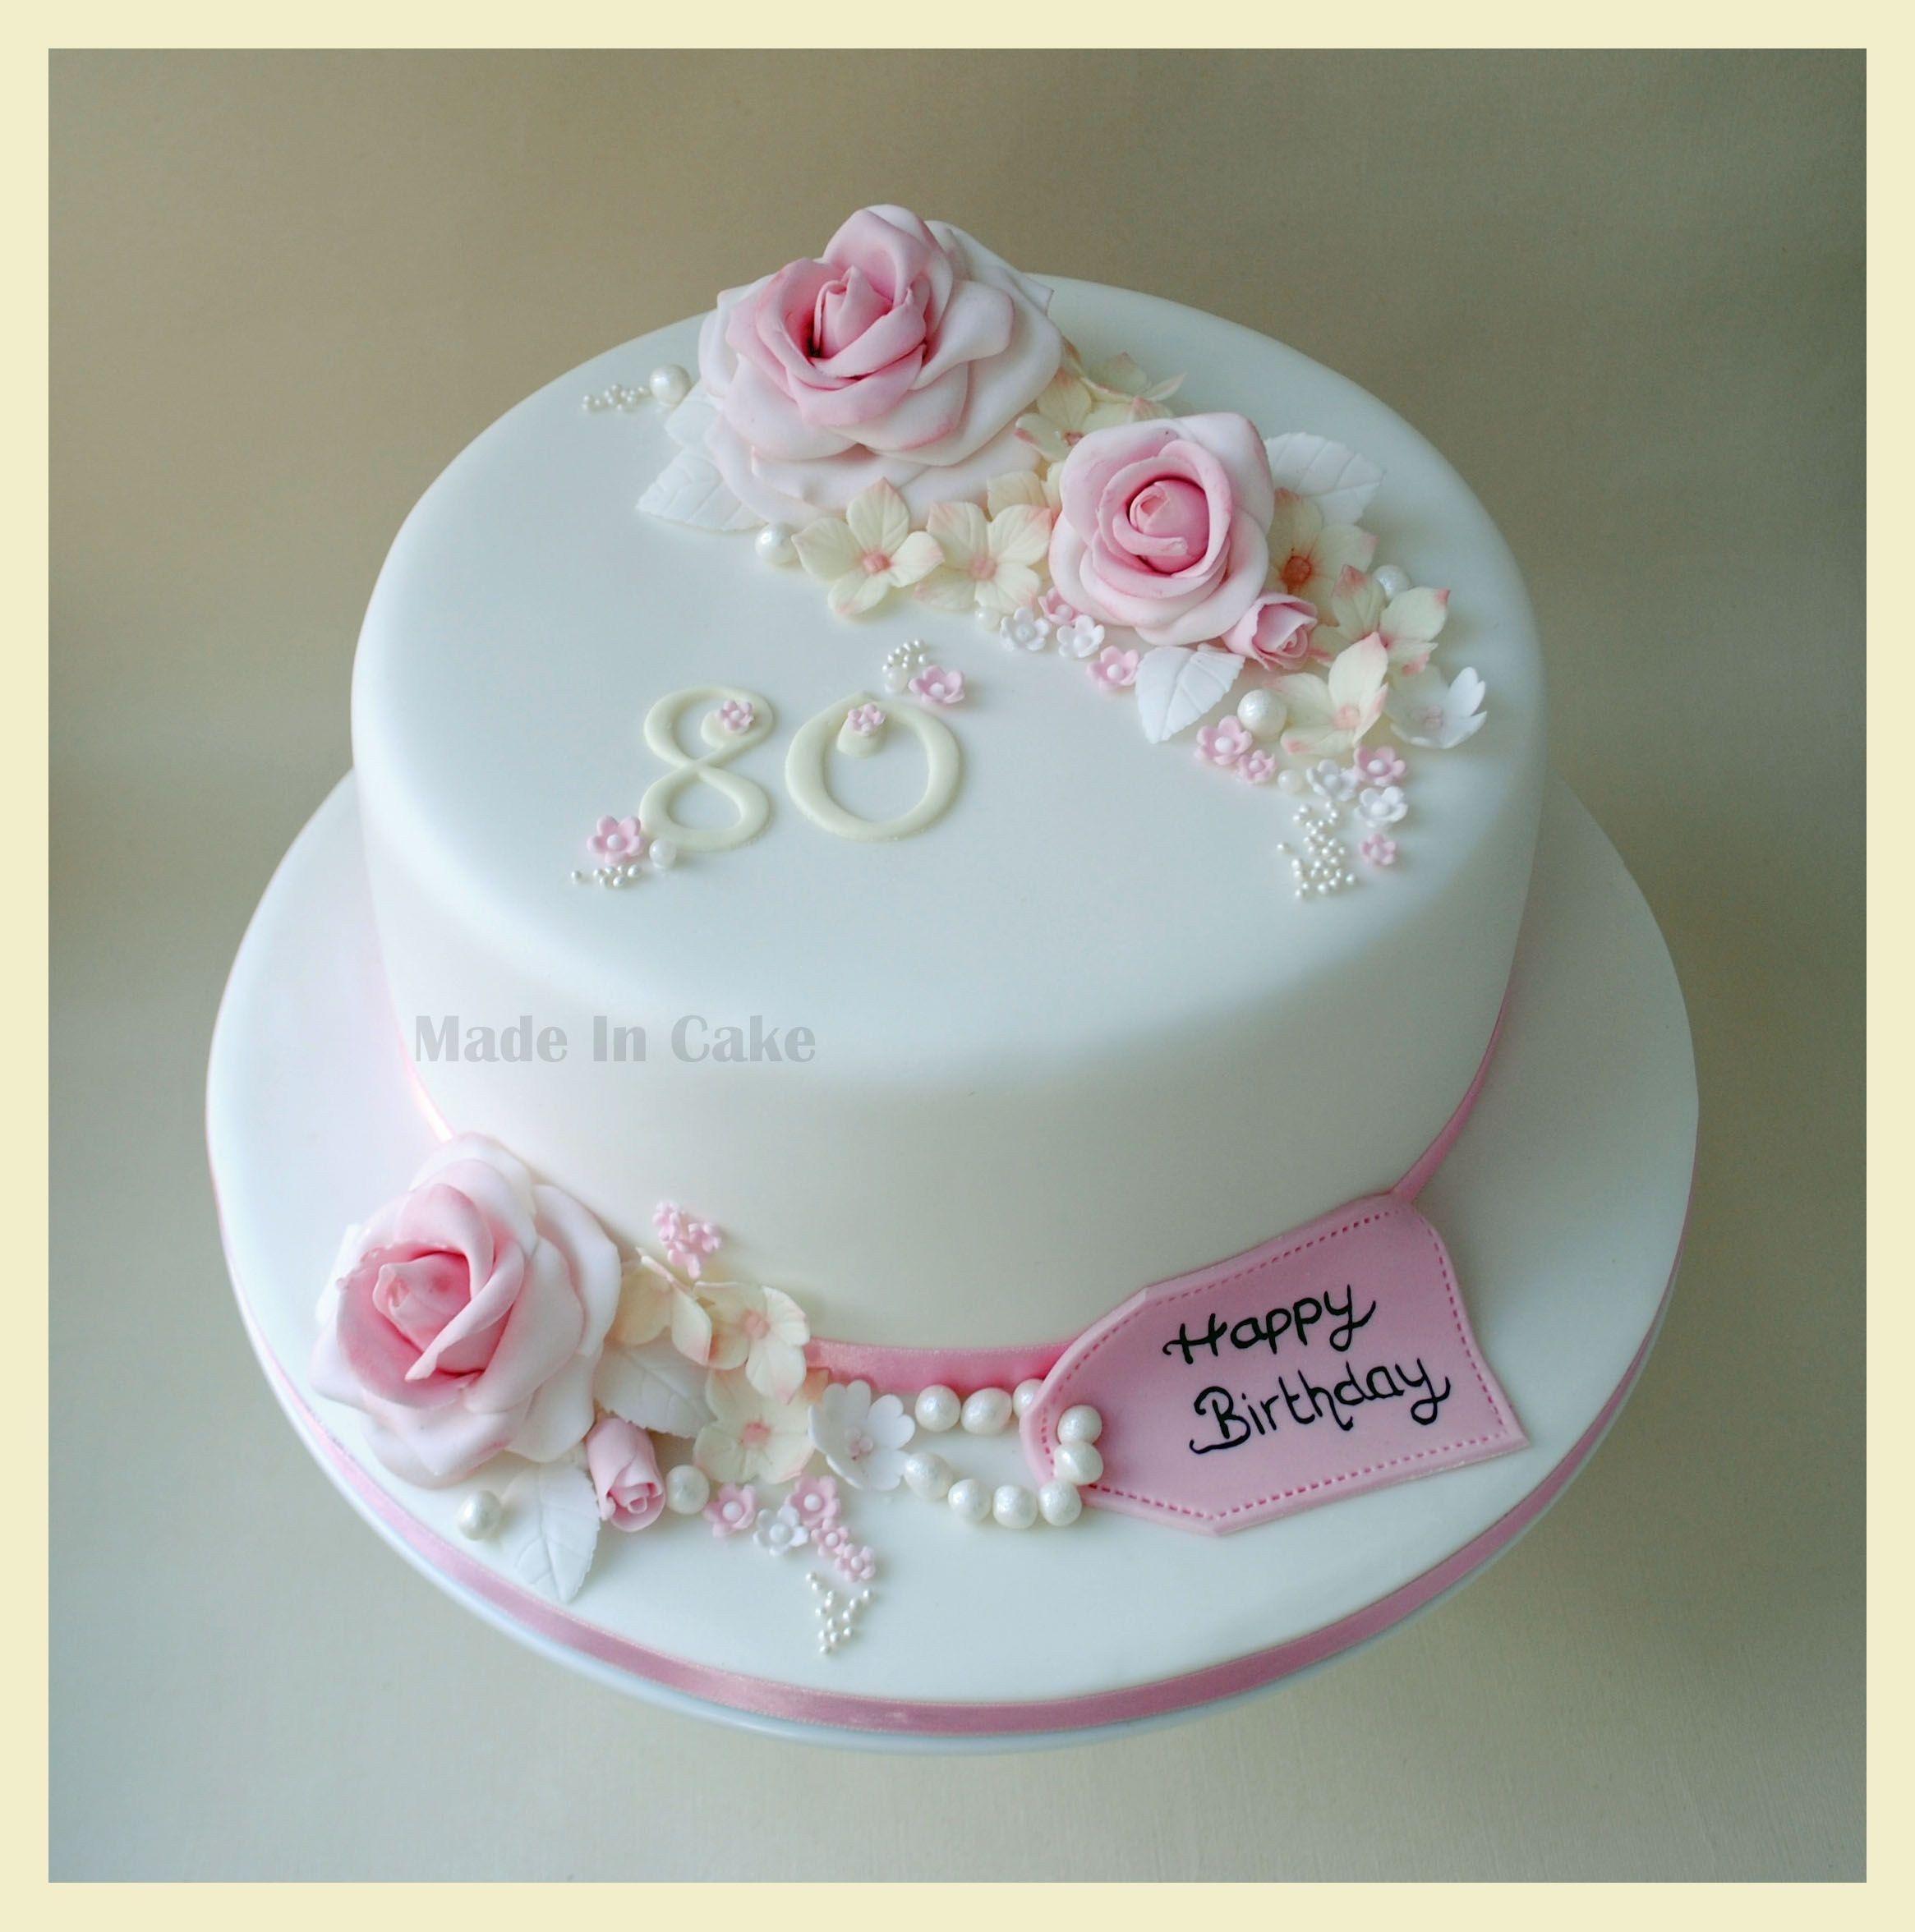 Admirable 32 Elegant Picture Of 80Th Birthday Cake Ideas 80 Birthday Cake Personalised Birthday Cards Bromeletsinfo